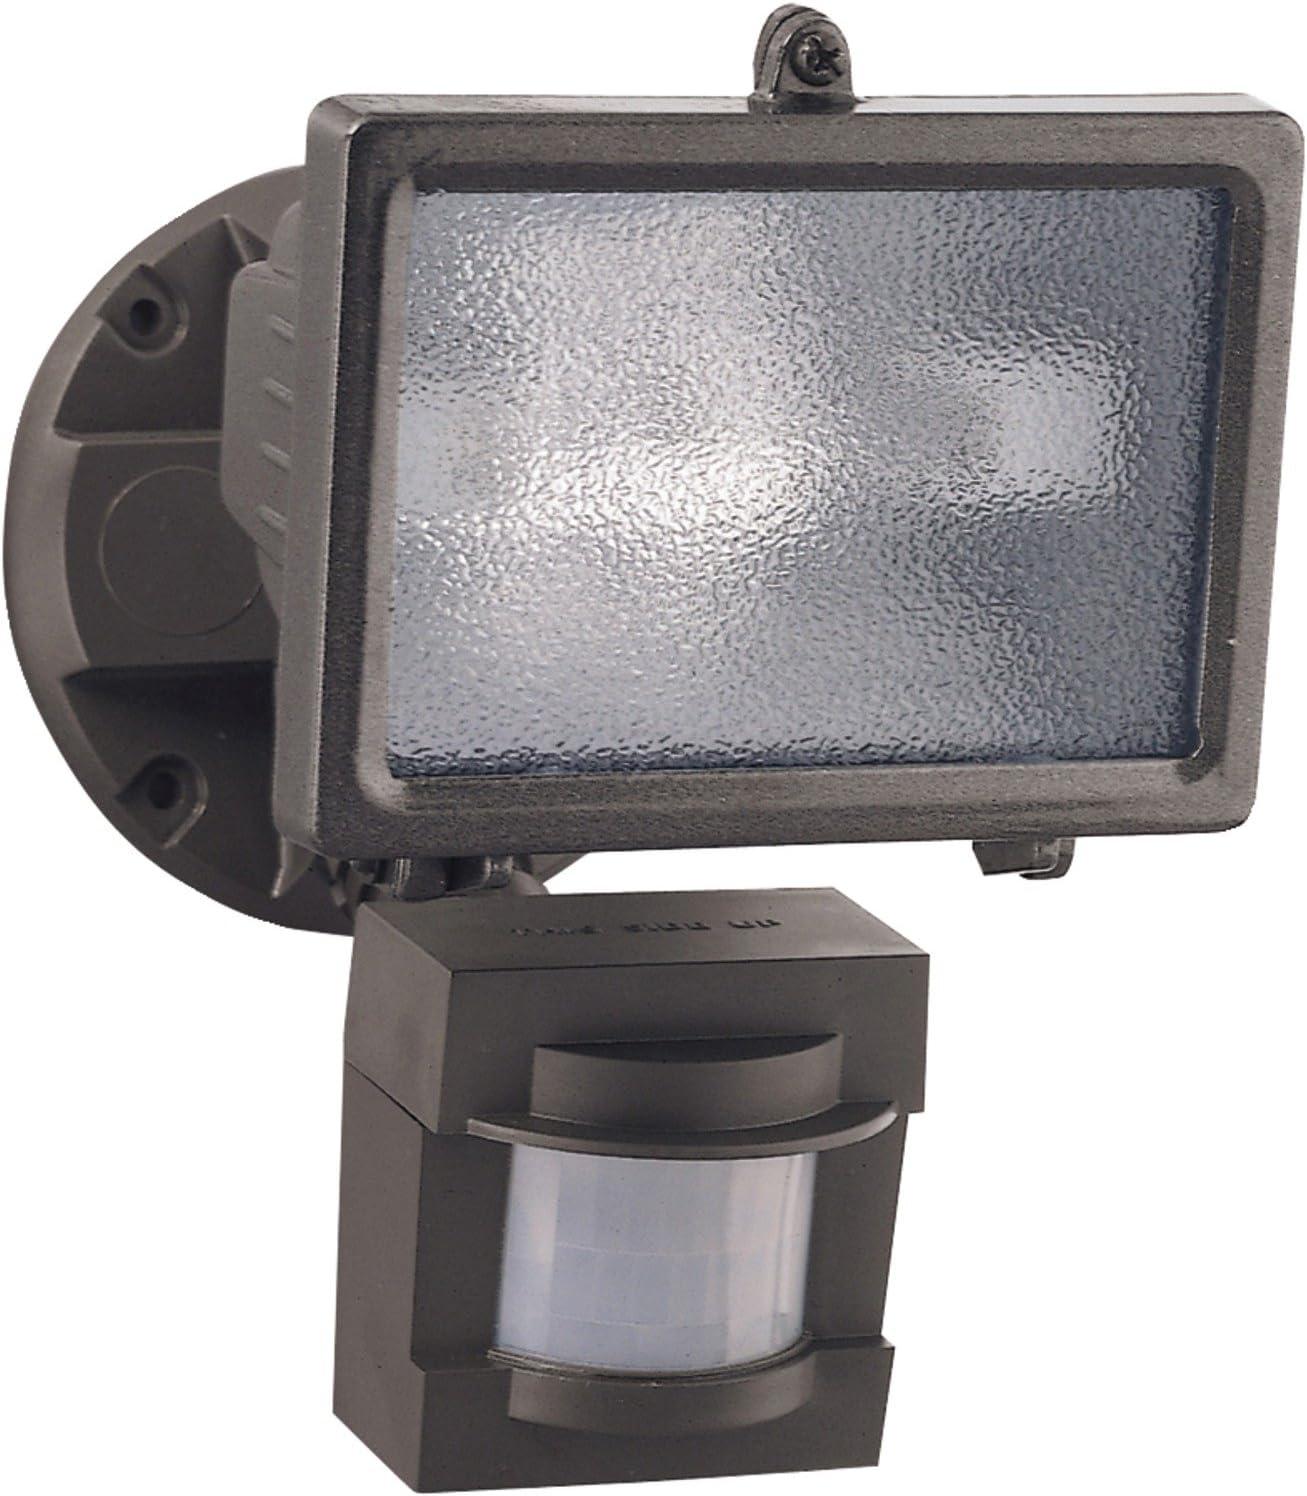 Amazon.com : Heath Zenith HZ-5511-BZ 110-Degree 150-Watt Motion-Sensing  Security Light, Bronze : Flood Lighting : Home ImprovementAmazon.com